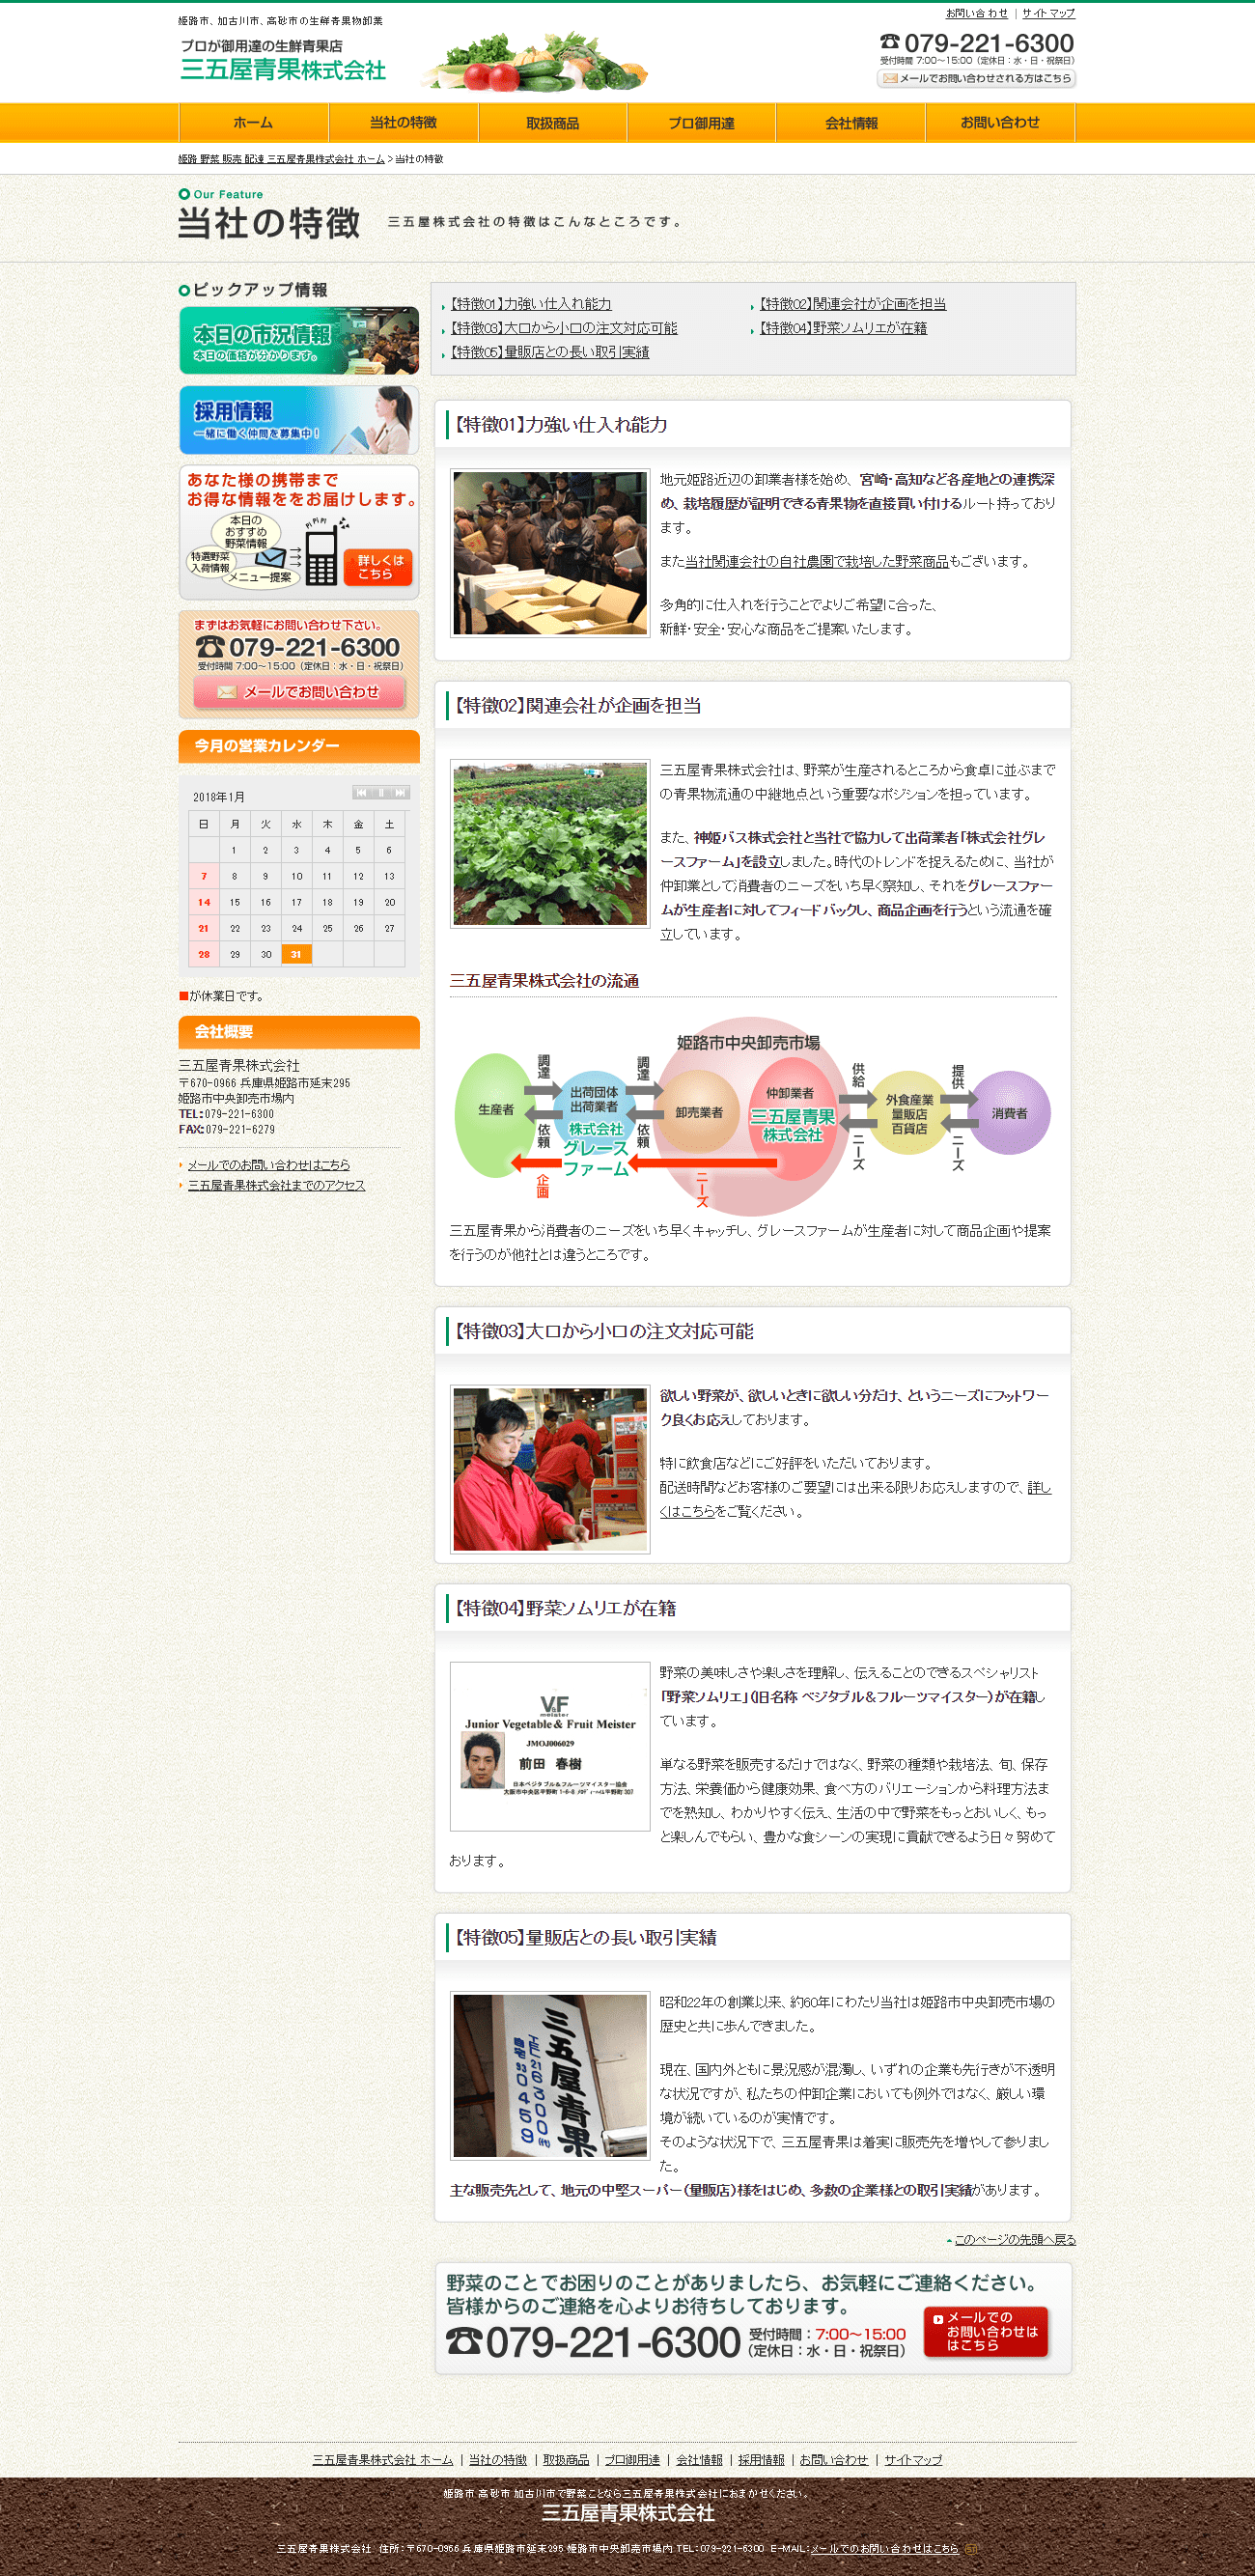 姫路市 三五屋青果株式会社様 ホームページ制作2